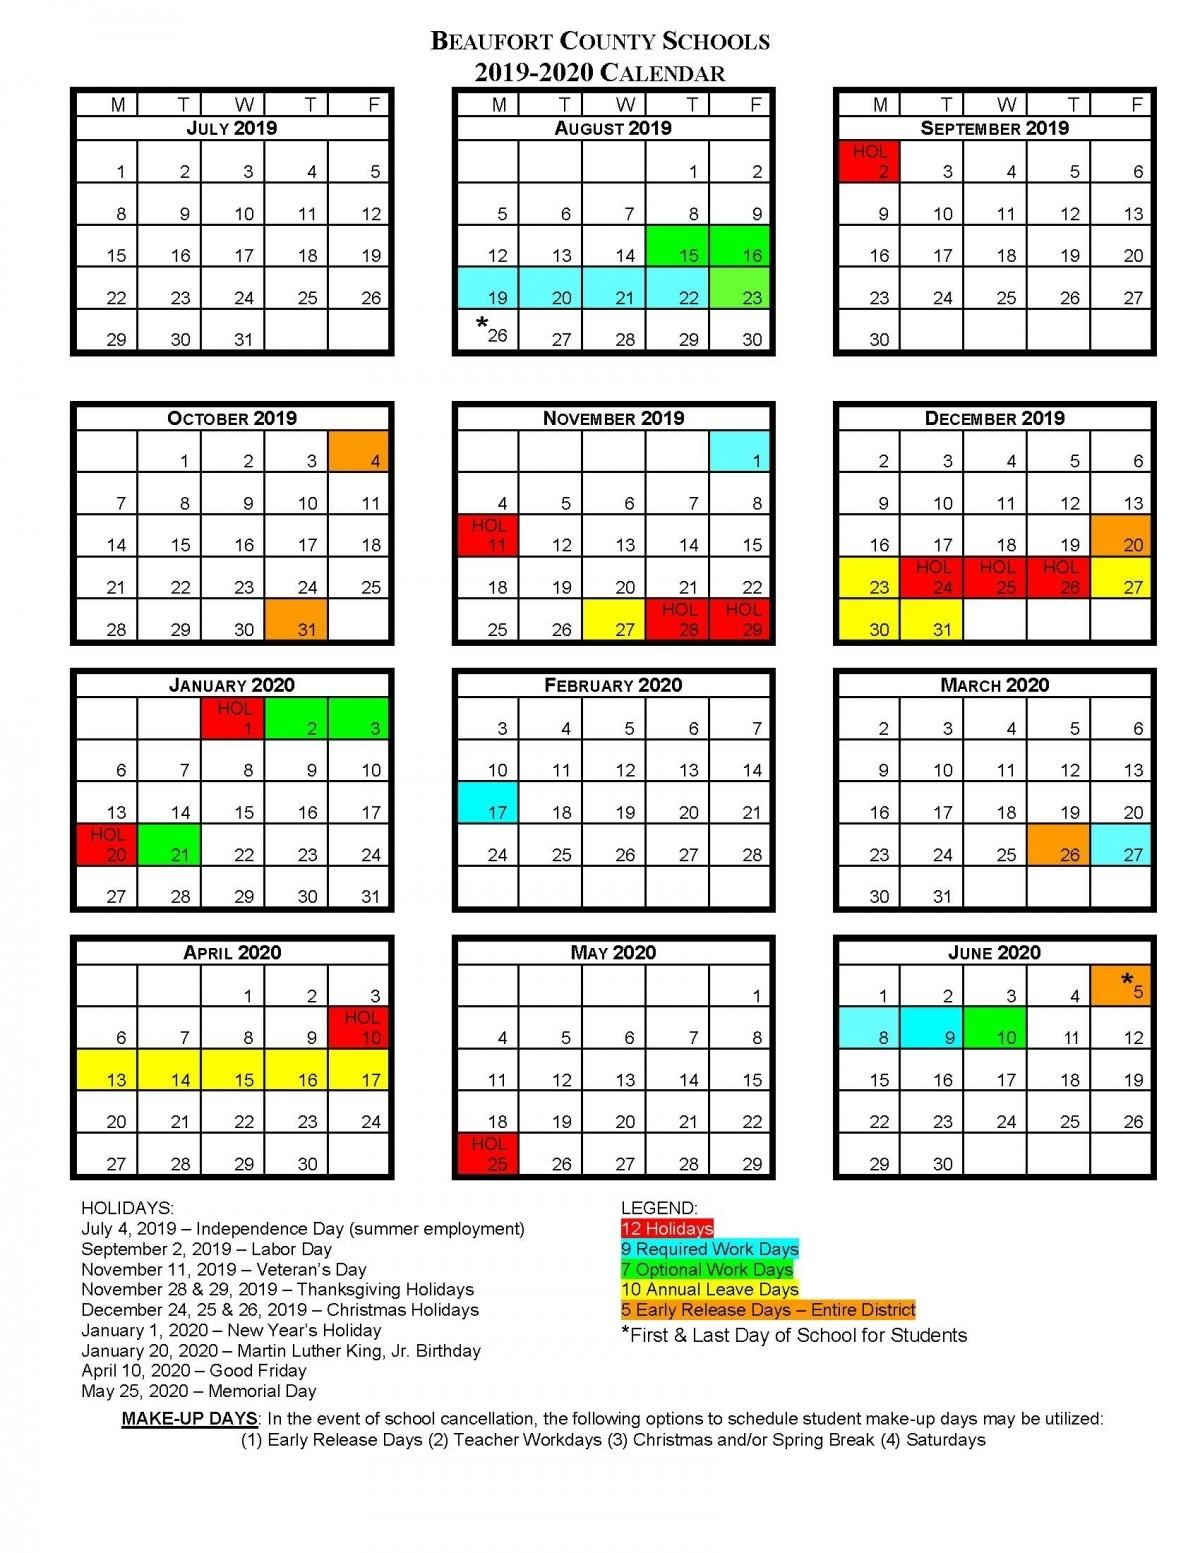 Bcs School Calendar | Beaufort County Schools regarding Homework Calendar 2019-2020